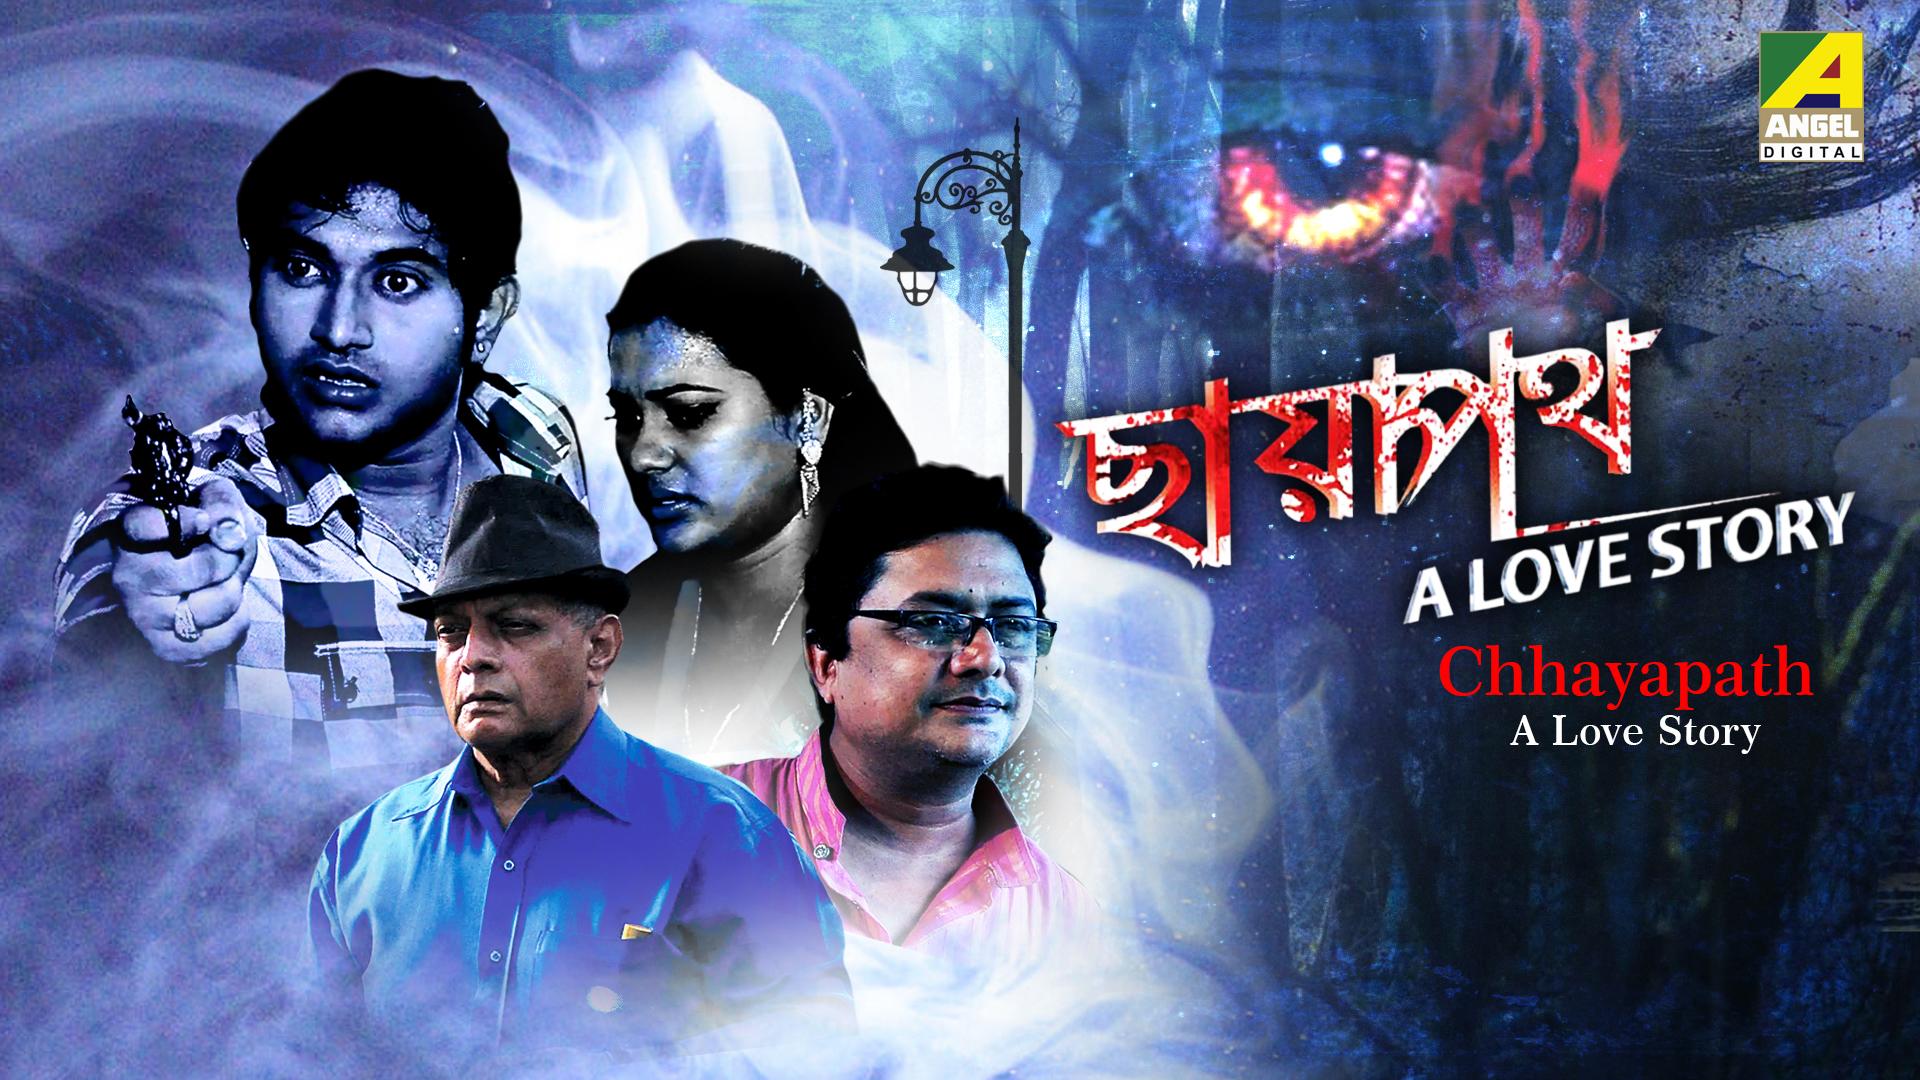 Chhayapath - A Love Story